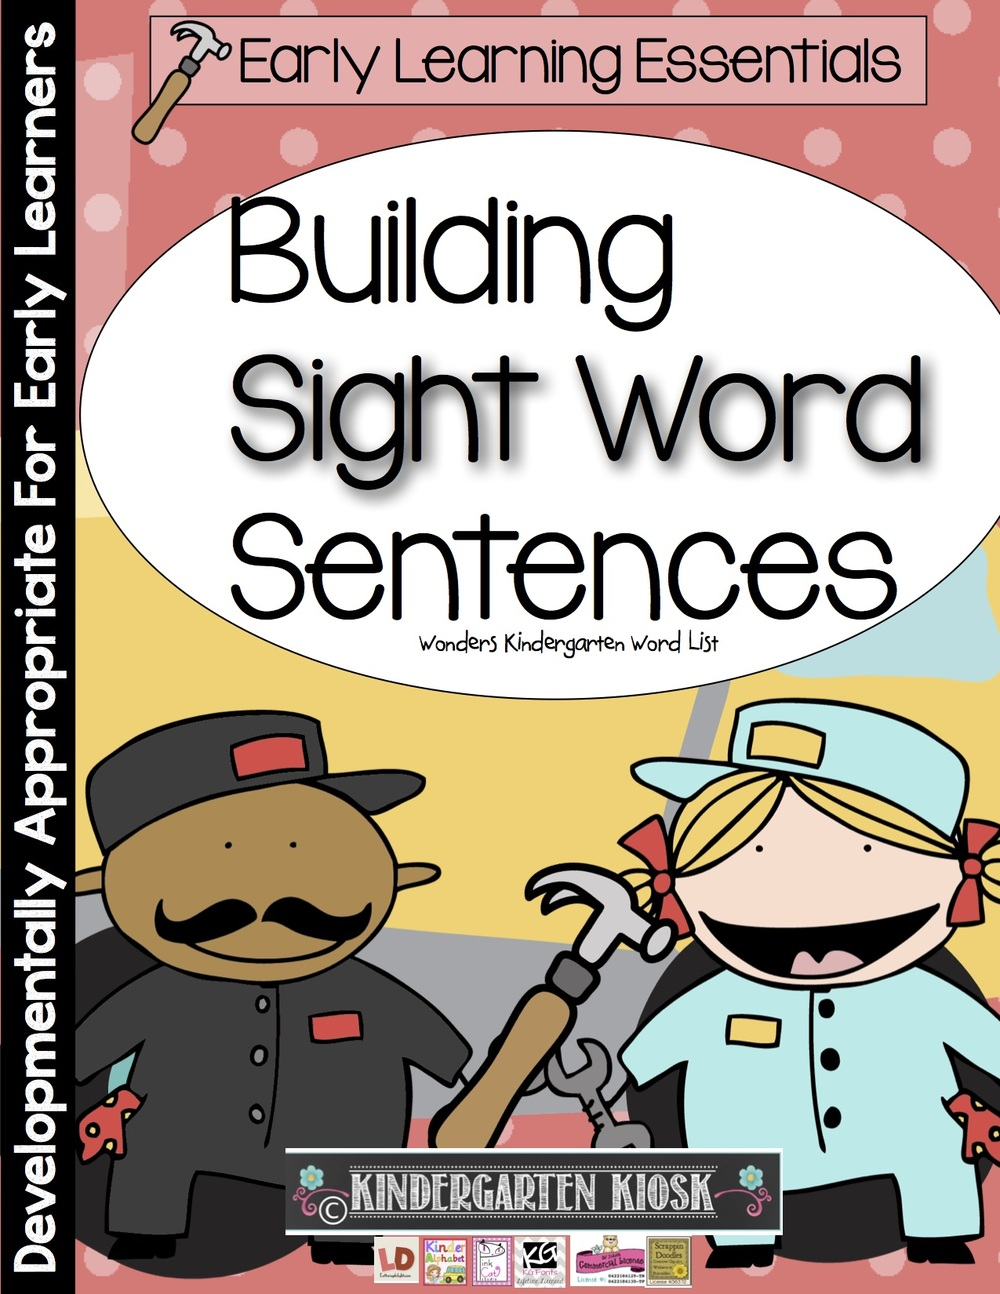 Building Sight Word Sentences